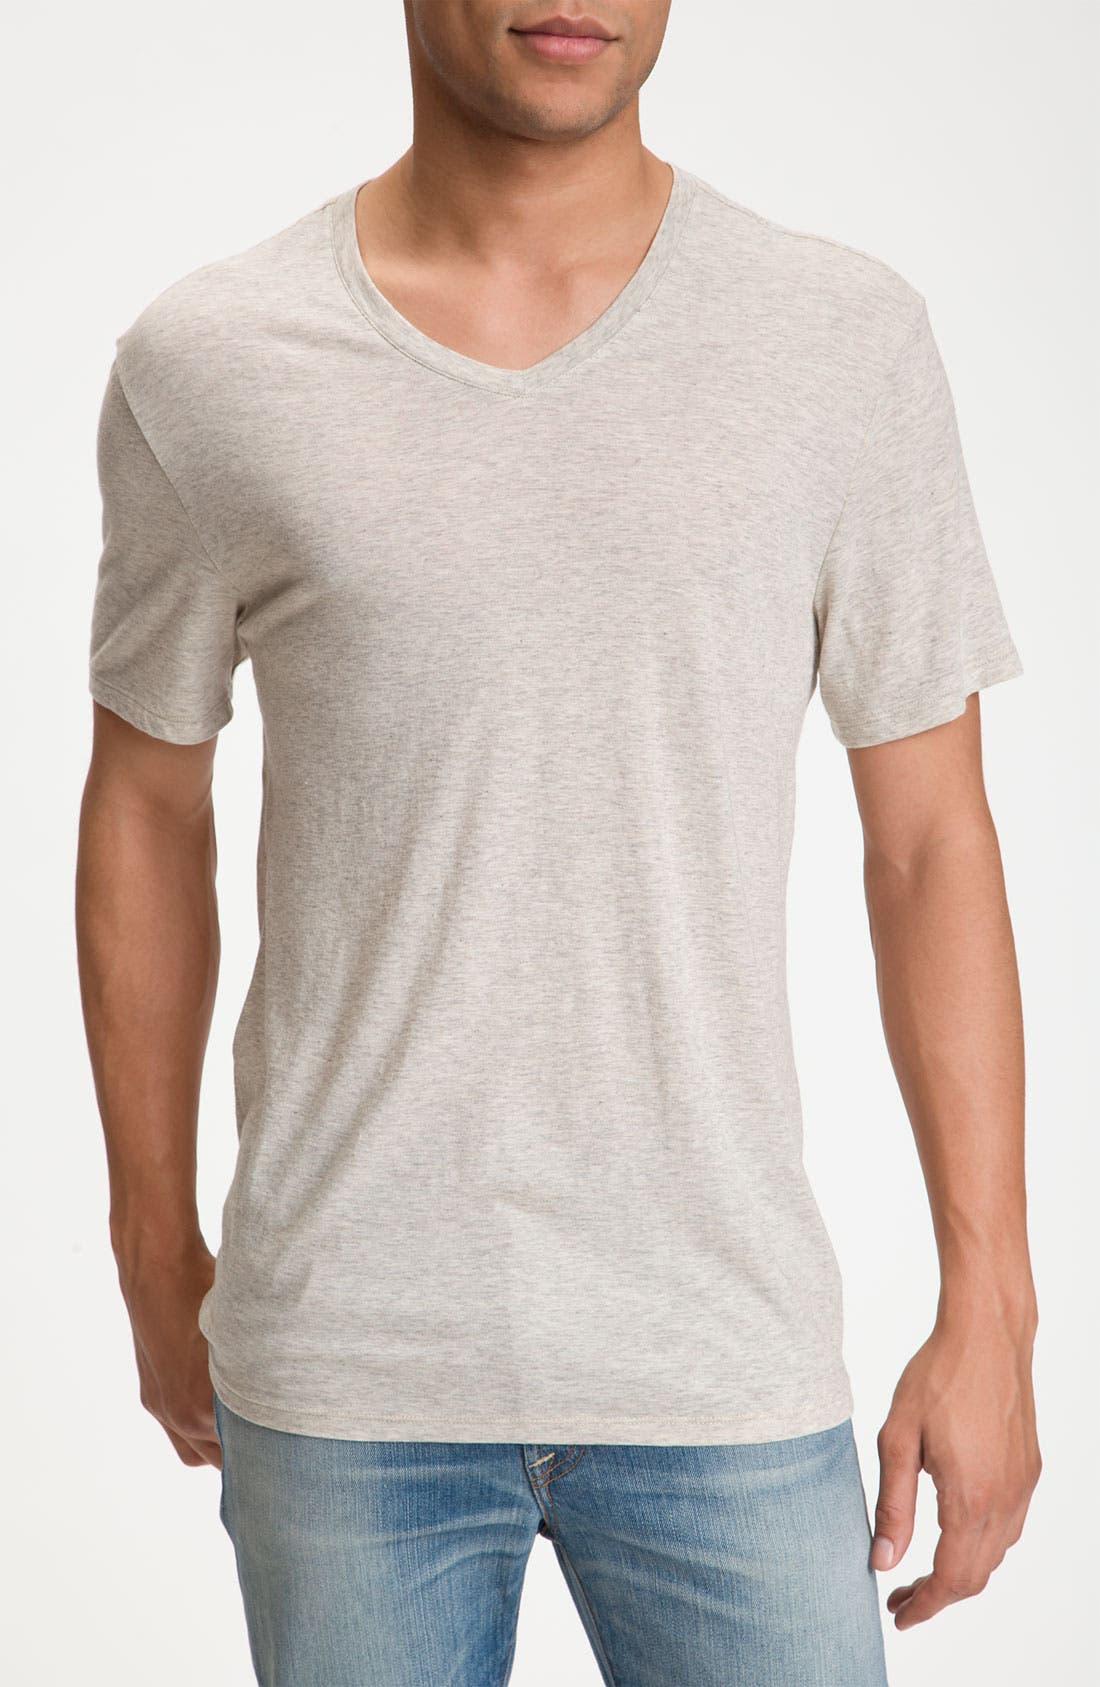 Alternate Image 1 Selected - Vince Short Sleeve V-Neck T-Shirt